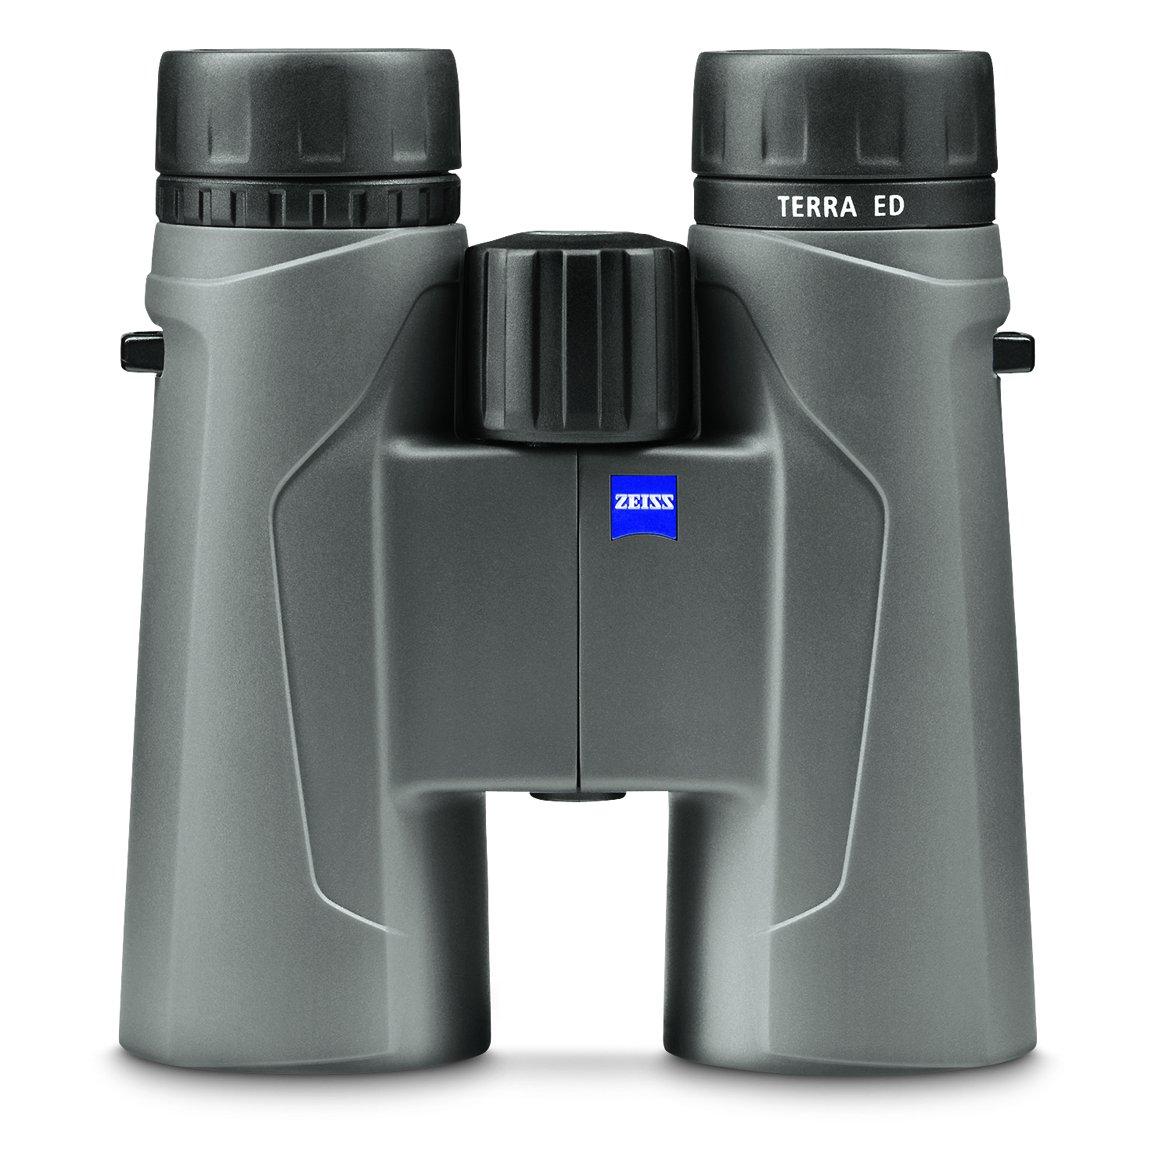 Zeiss 524204 9907 10 x 42 mm Terra ED双眼鏡(クールグレー) B06WW9P1NB